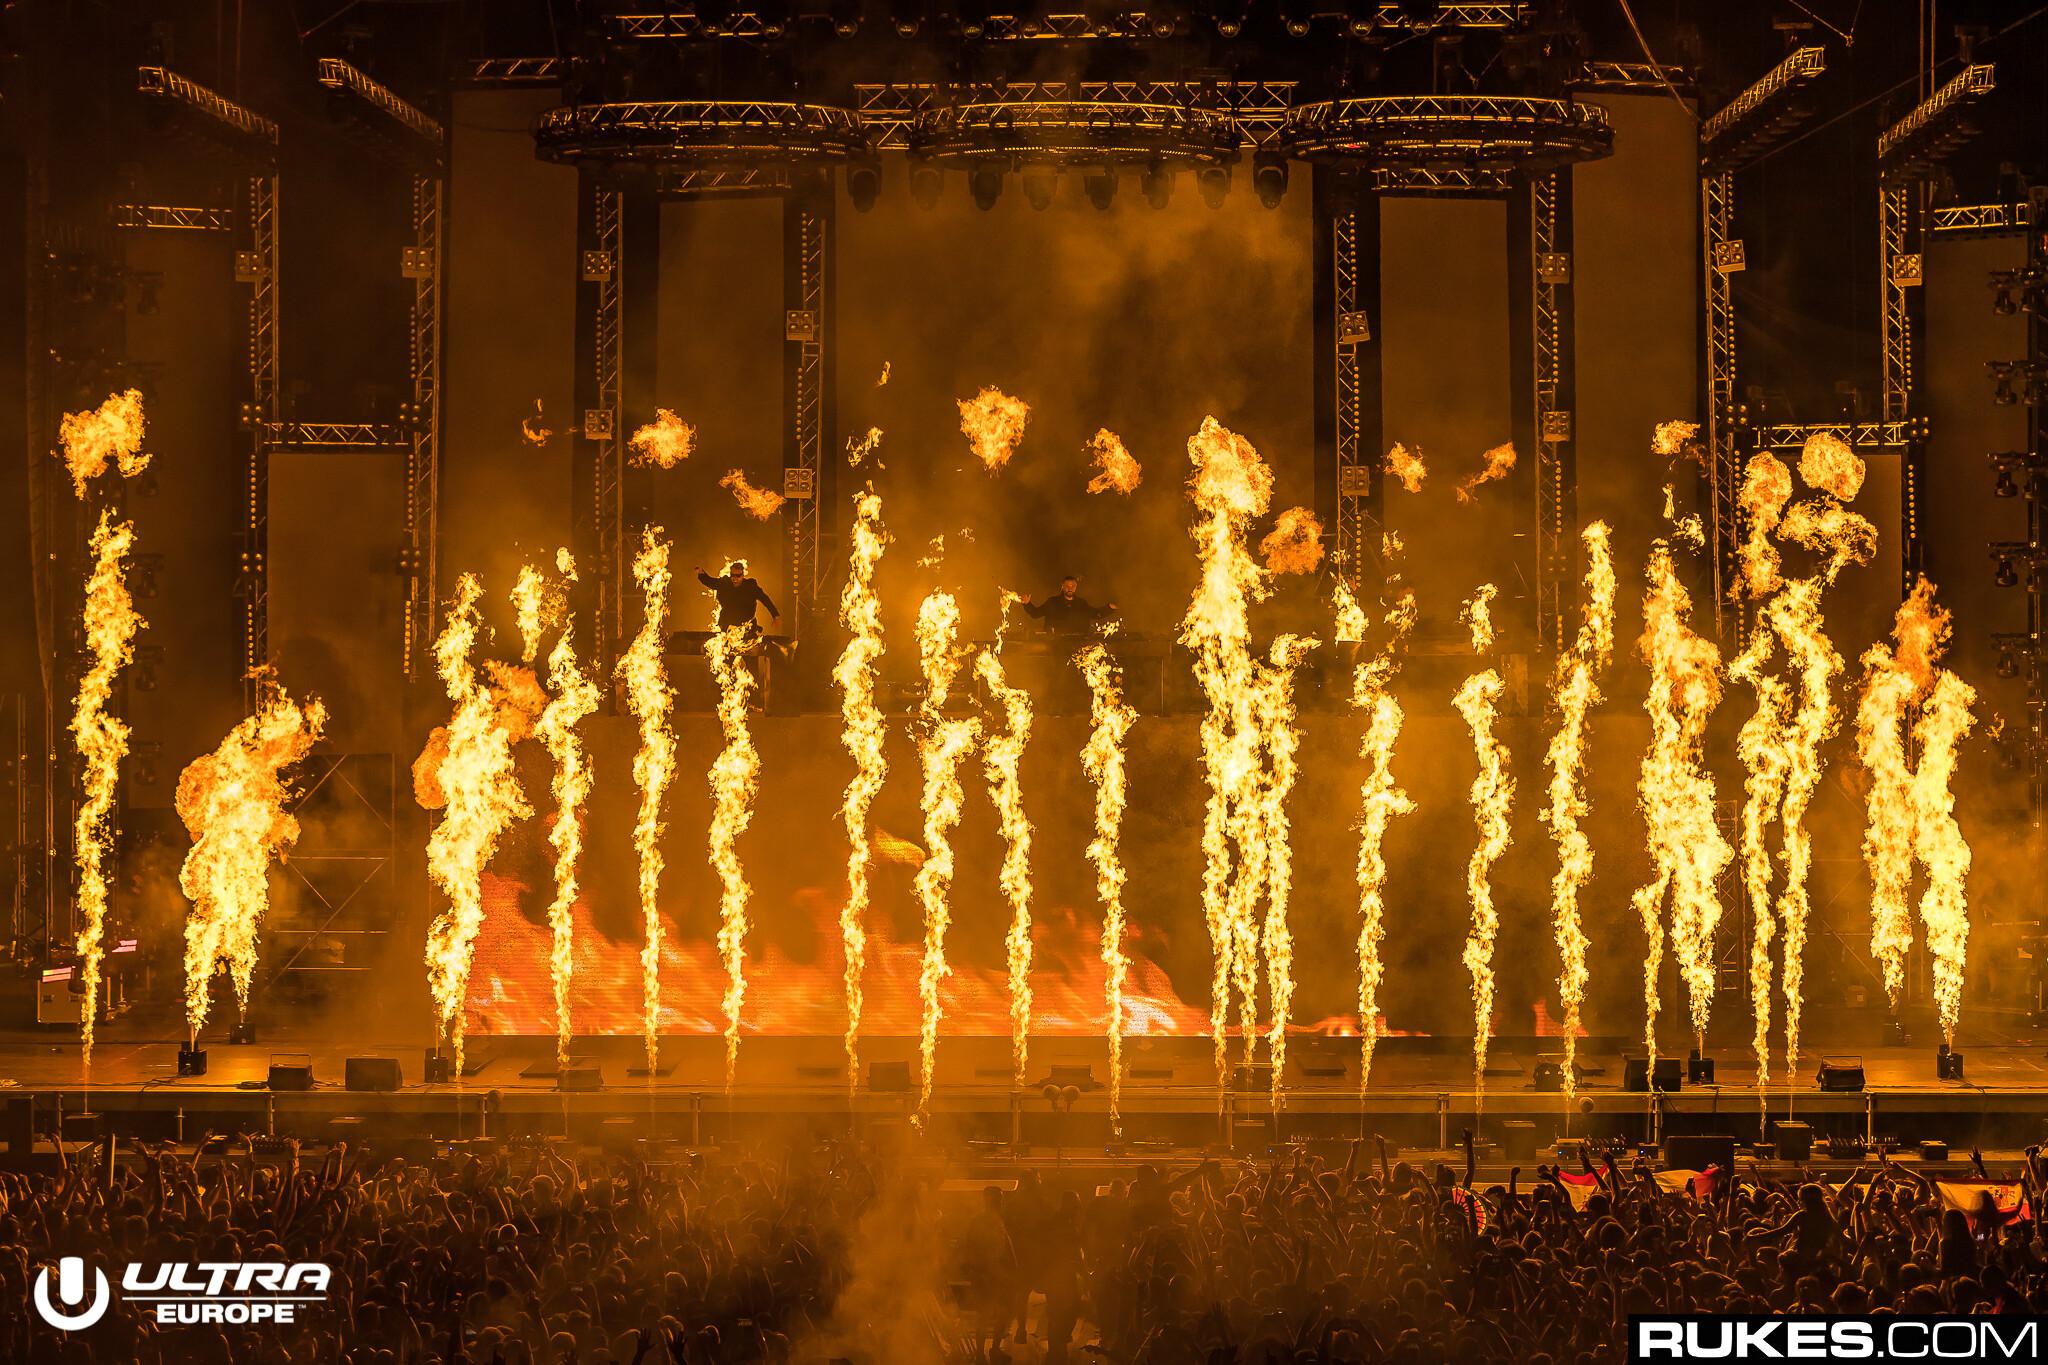 REPORT: Swedish House Mafia Pyro At Creamfields Caused £4M